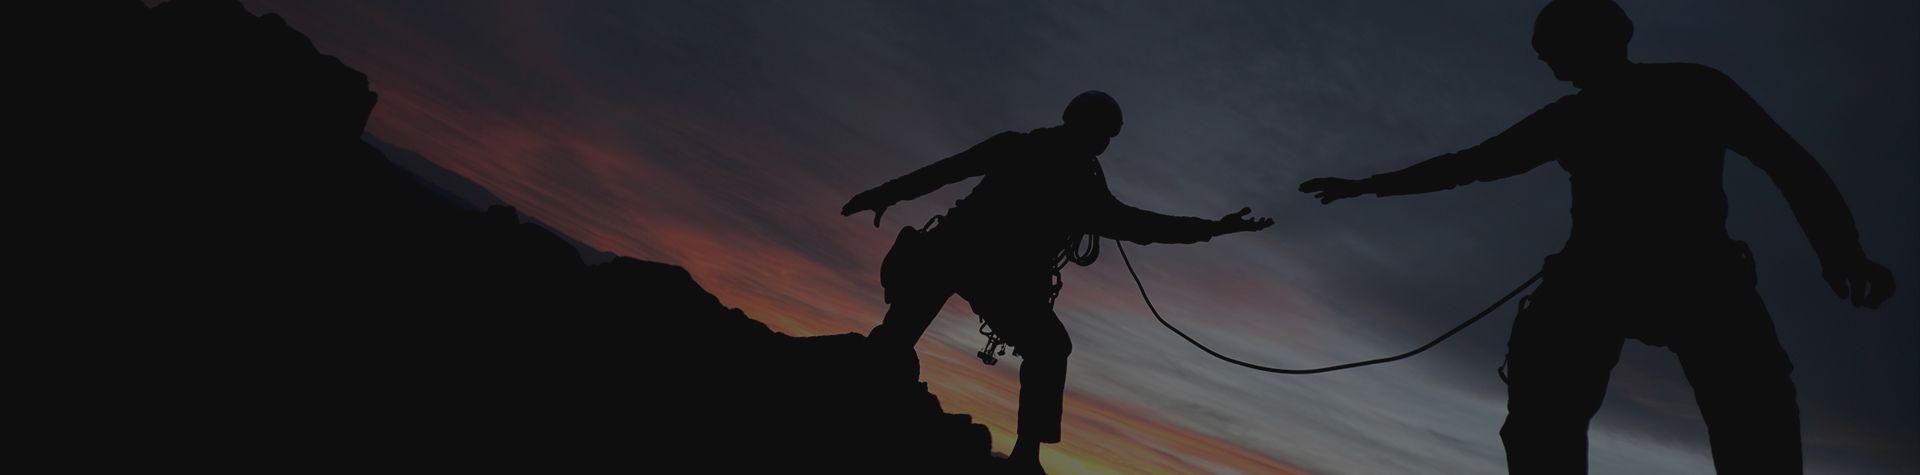 climbers walking on rocks in the dark